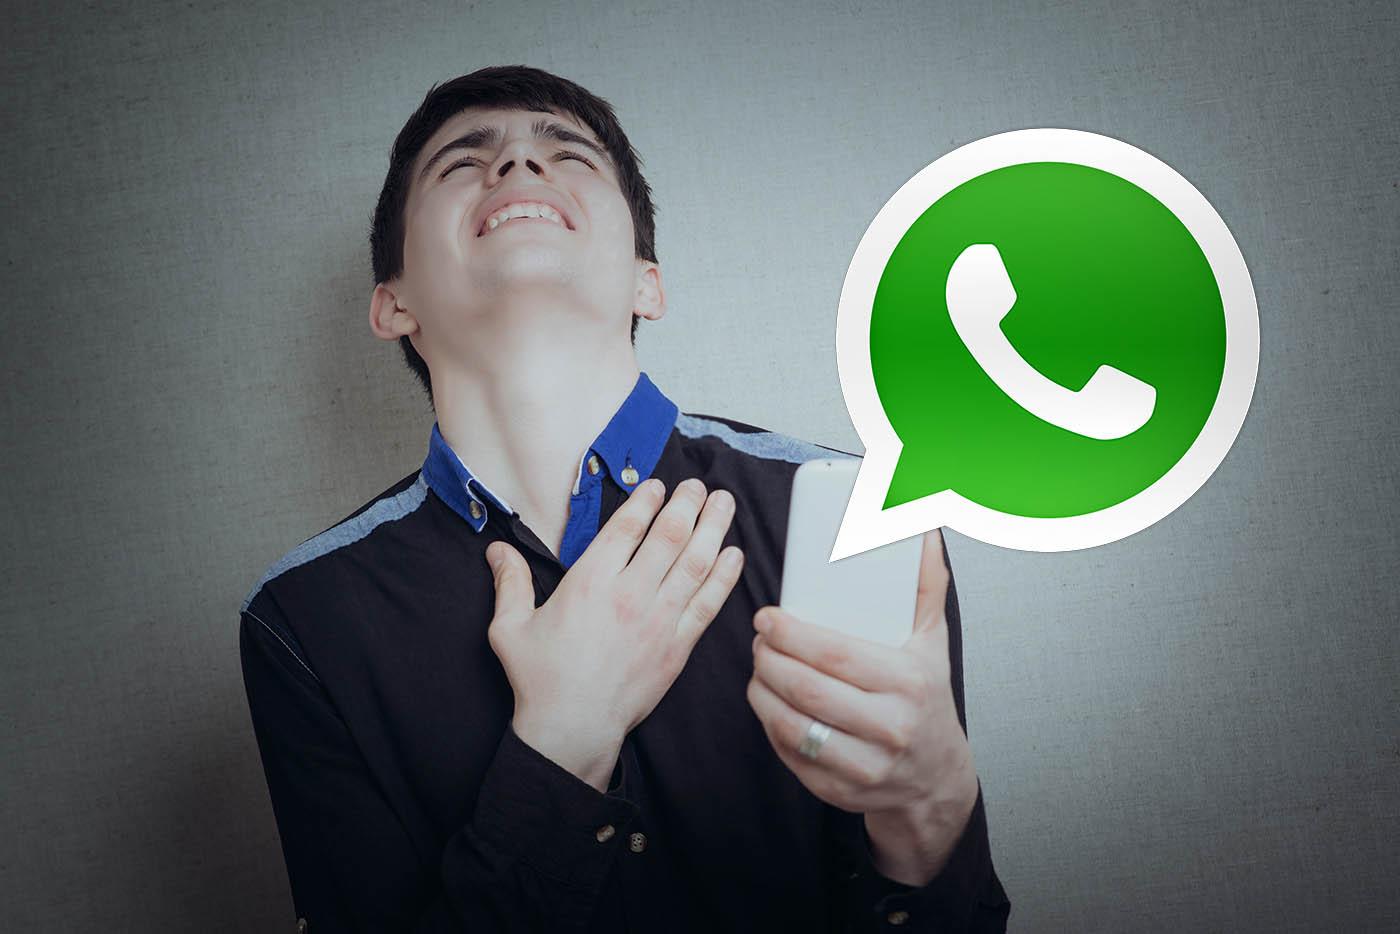 WhatsApp mensaje equivocado